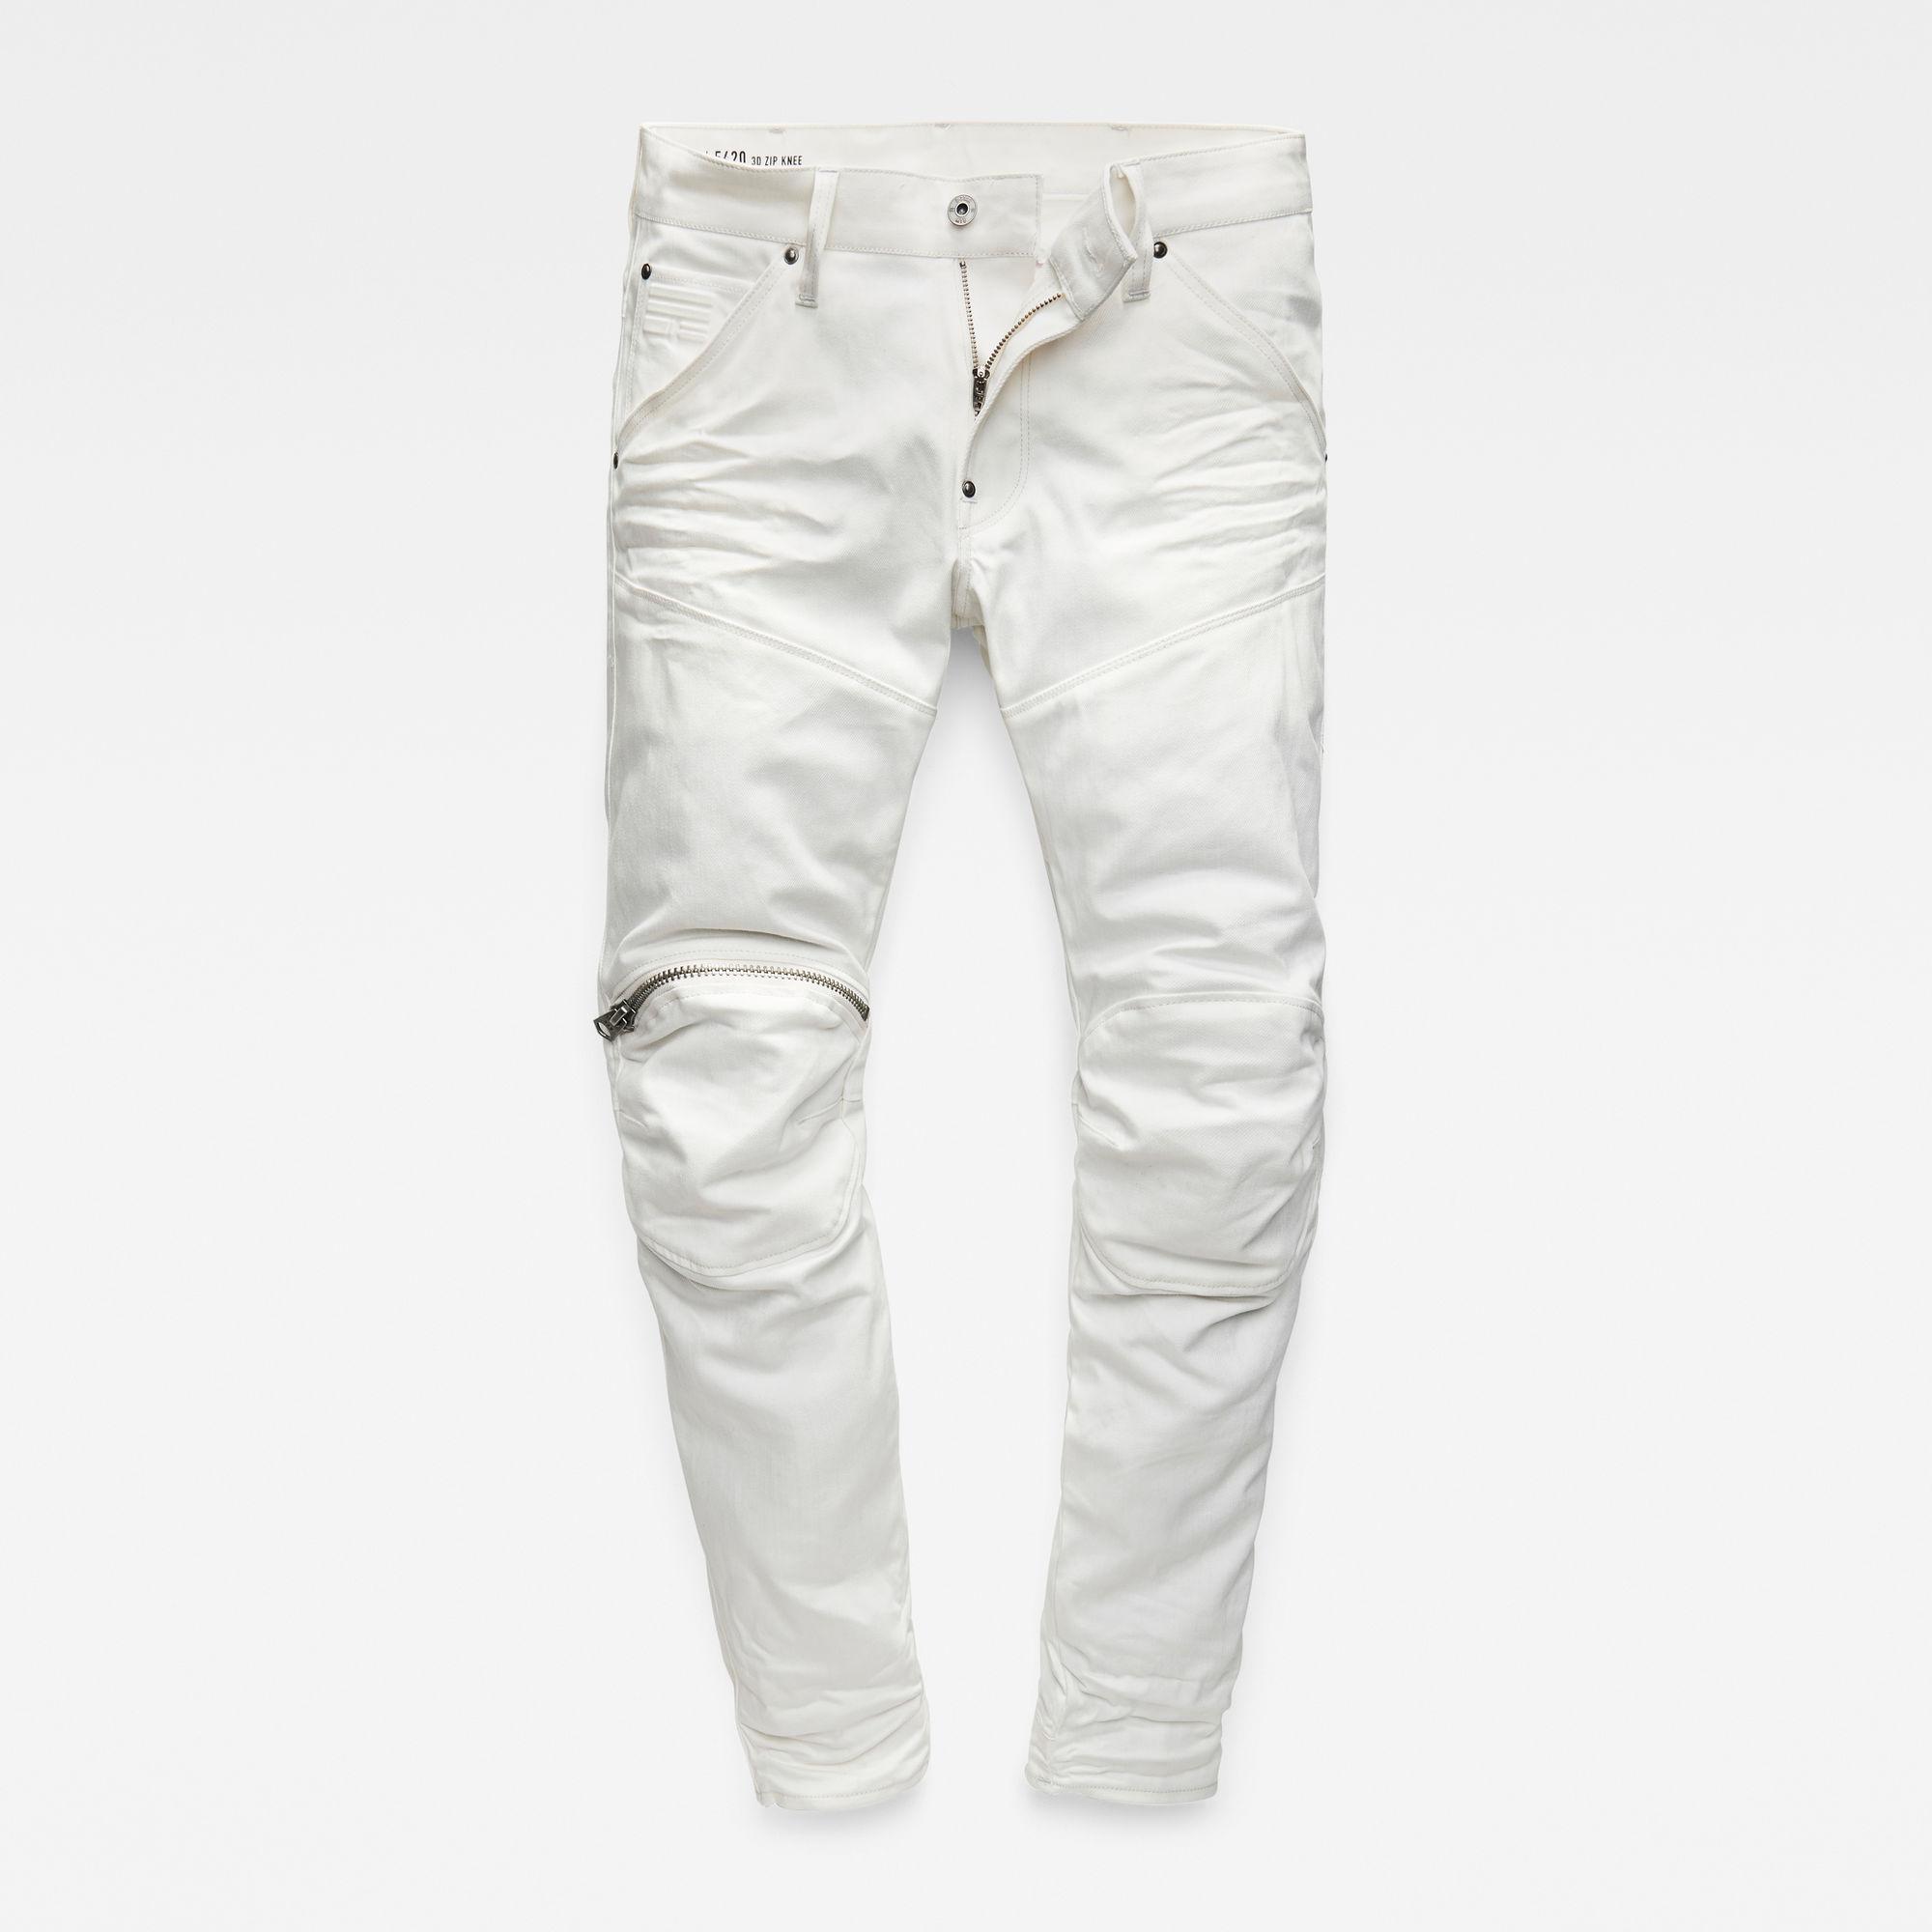 5620 G-Star Elwood 3D 3D Zip-Knee Super Slim Jeans